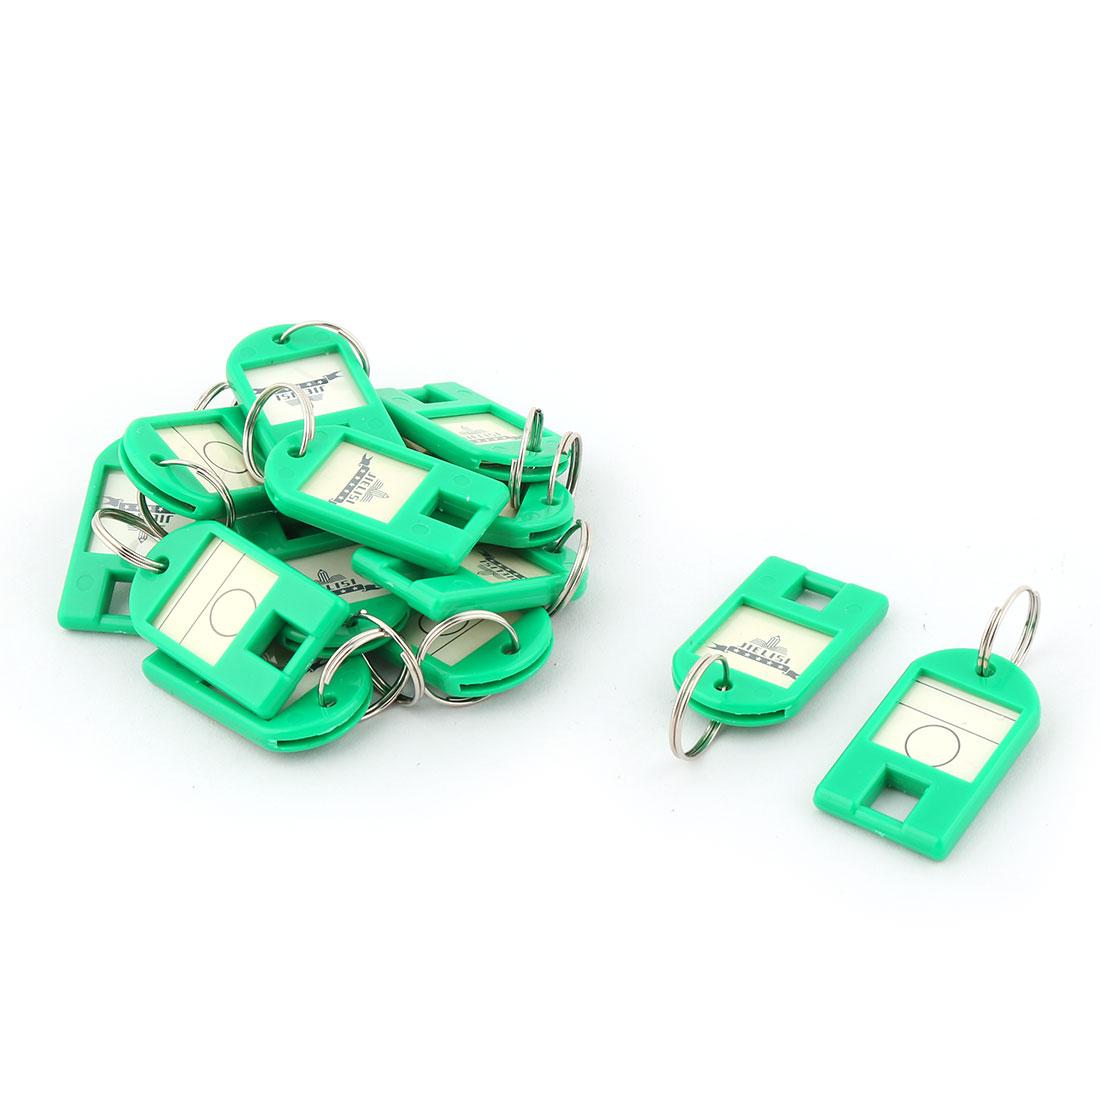 Metal Ring ID Label Name Tag Key Fobs Luggage Bag Marking Keyring Green 15pcs